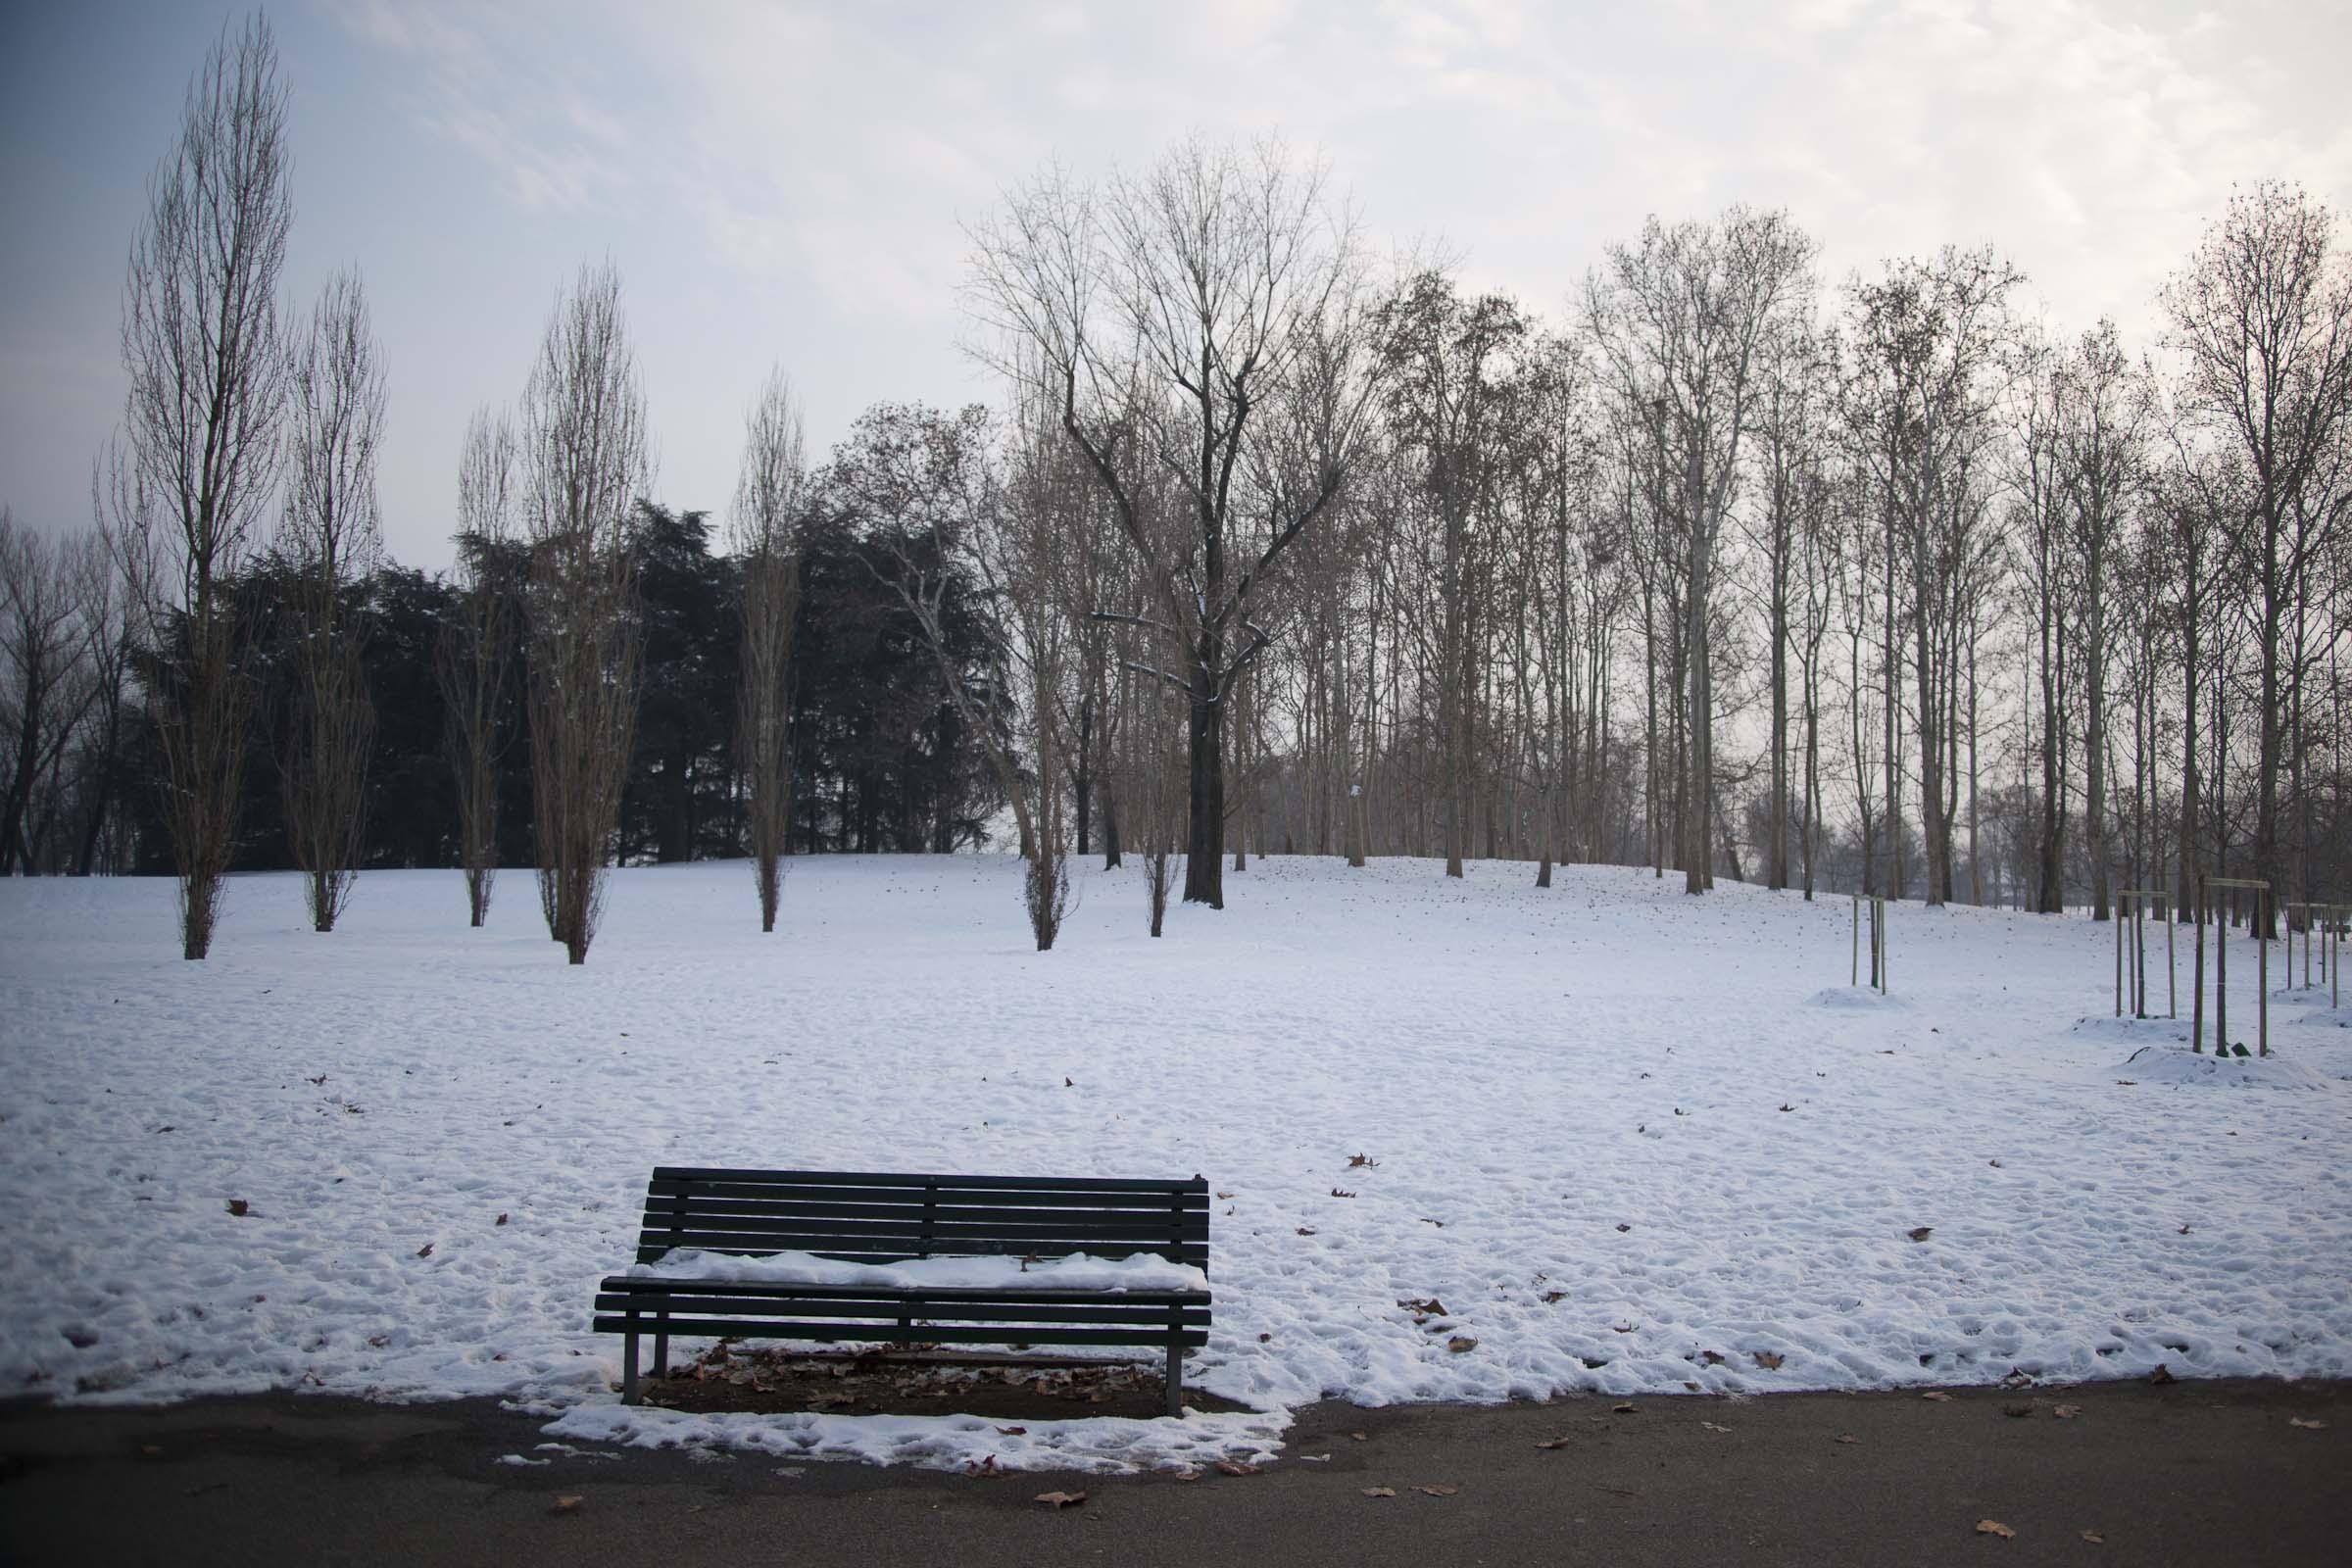 03 - Alone Bench